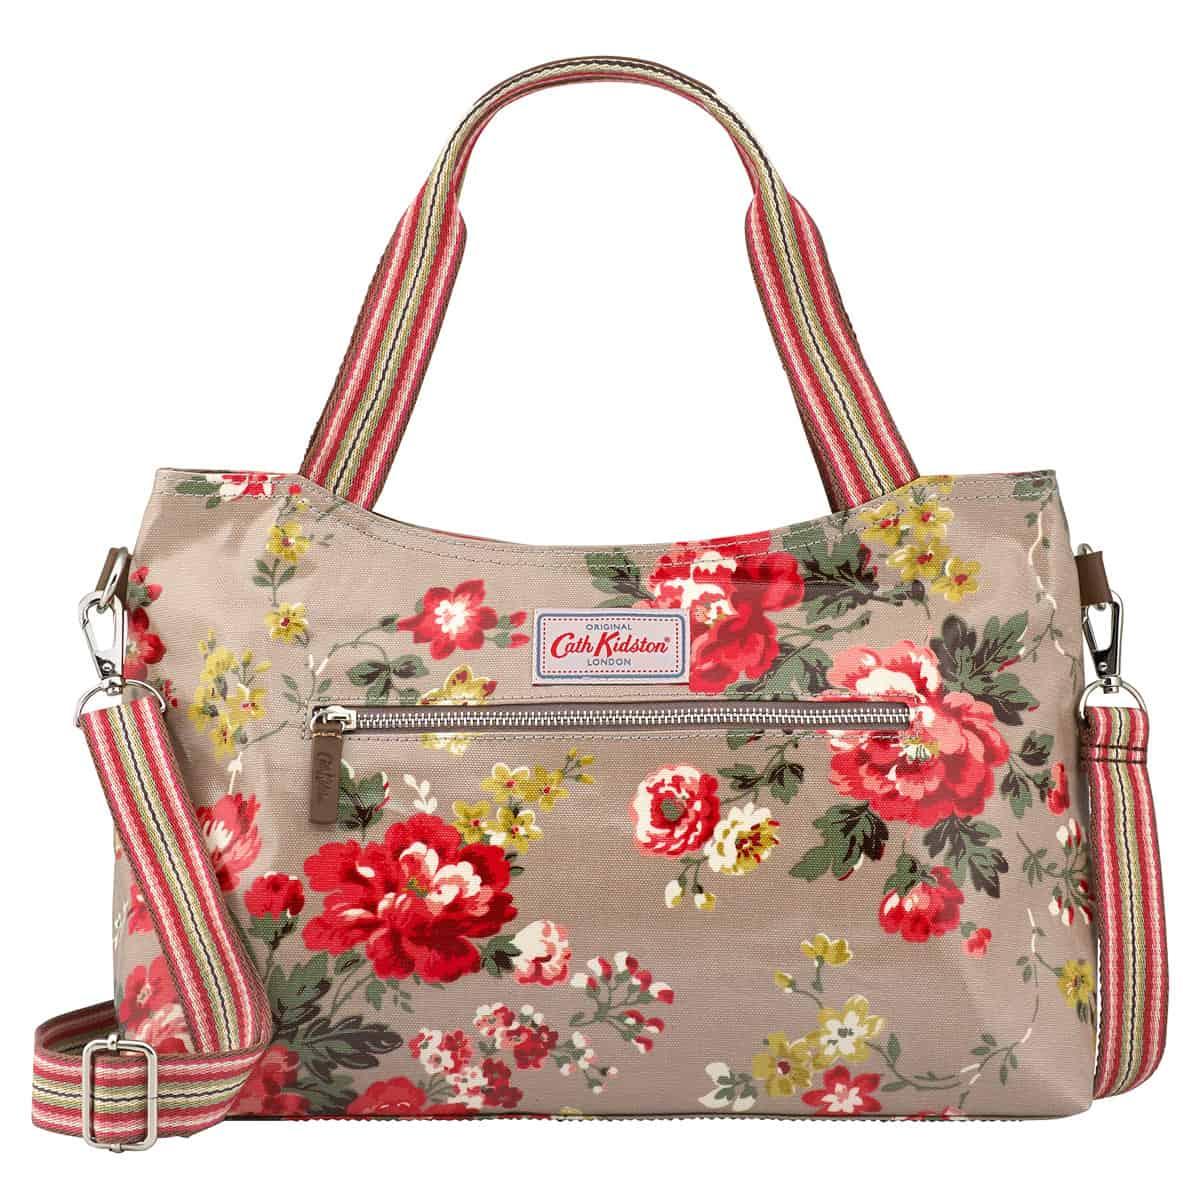 Cath Kidston winter rose handbag